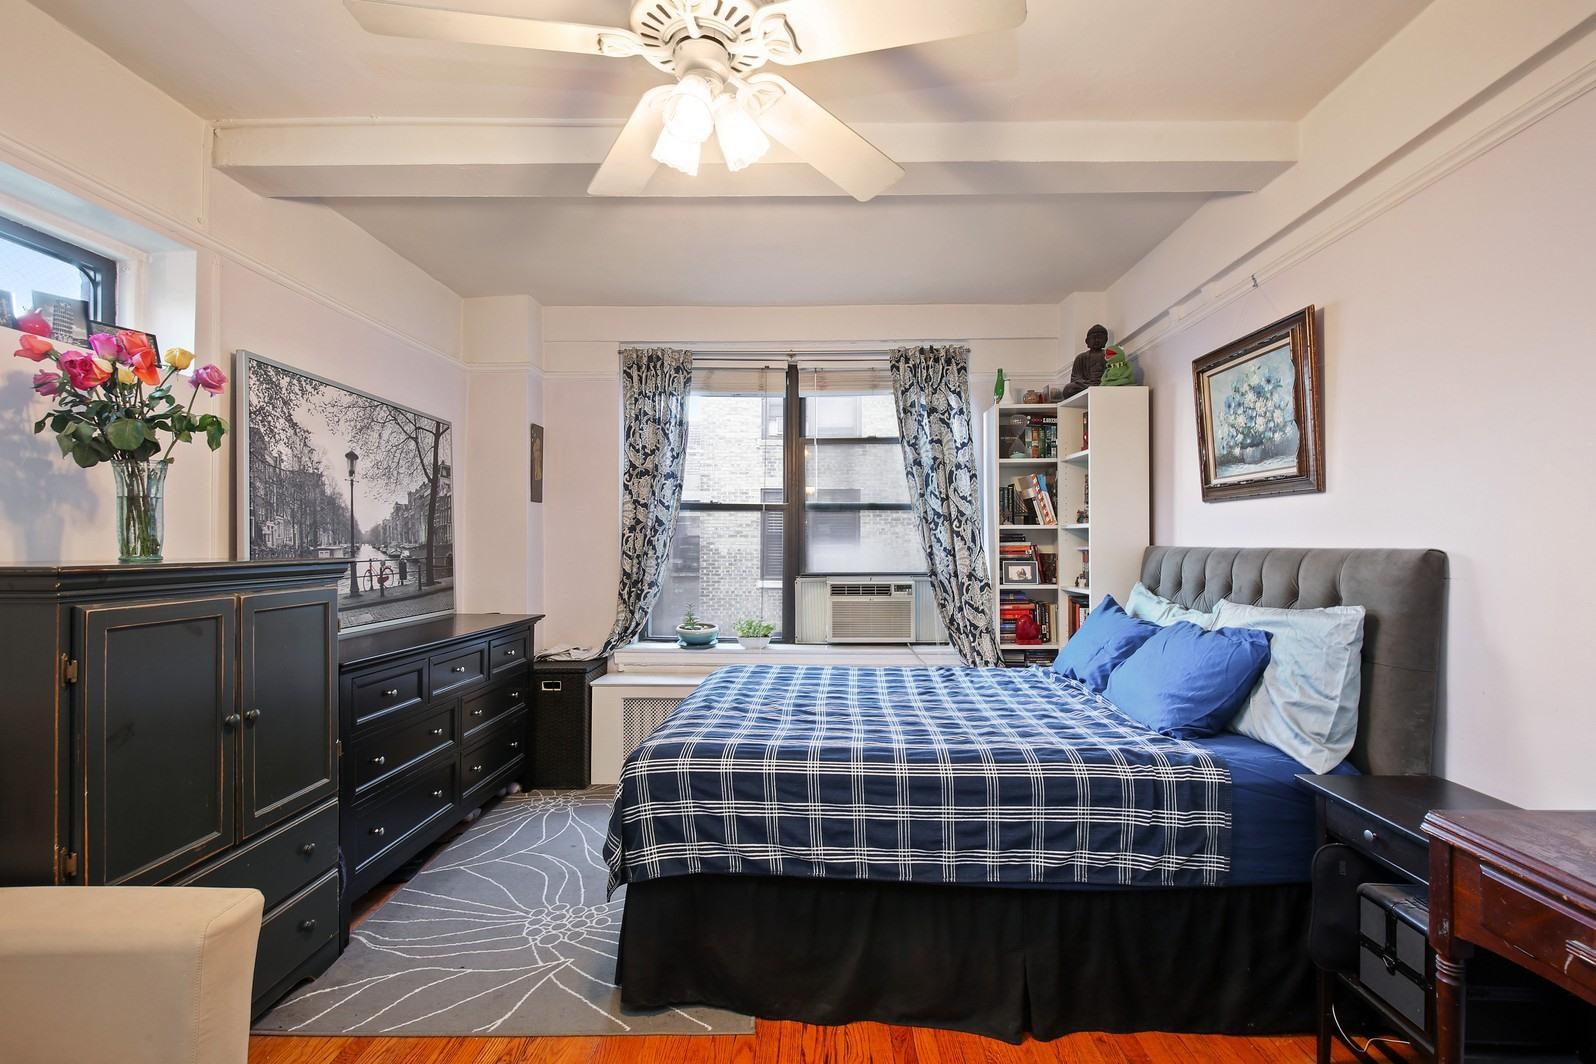 841681933 235w102ndst apt15u 18 bedroom custom resized 433653444 1600x1064zip 1600x1064